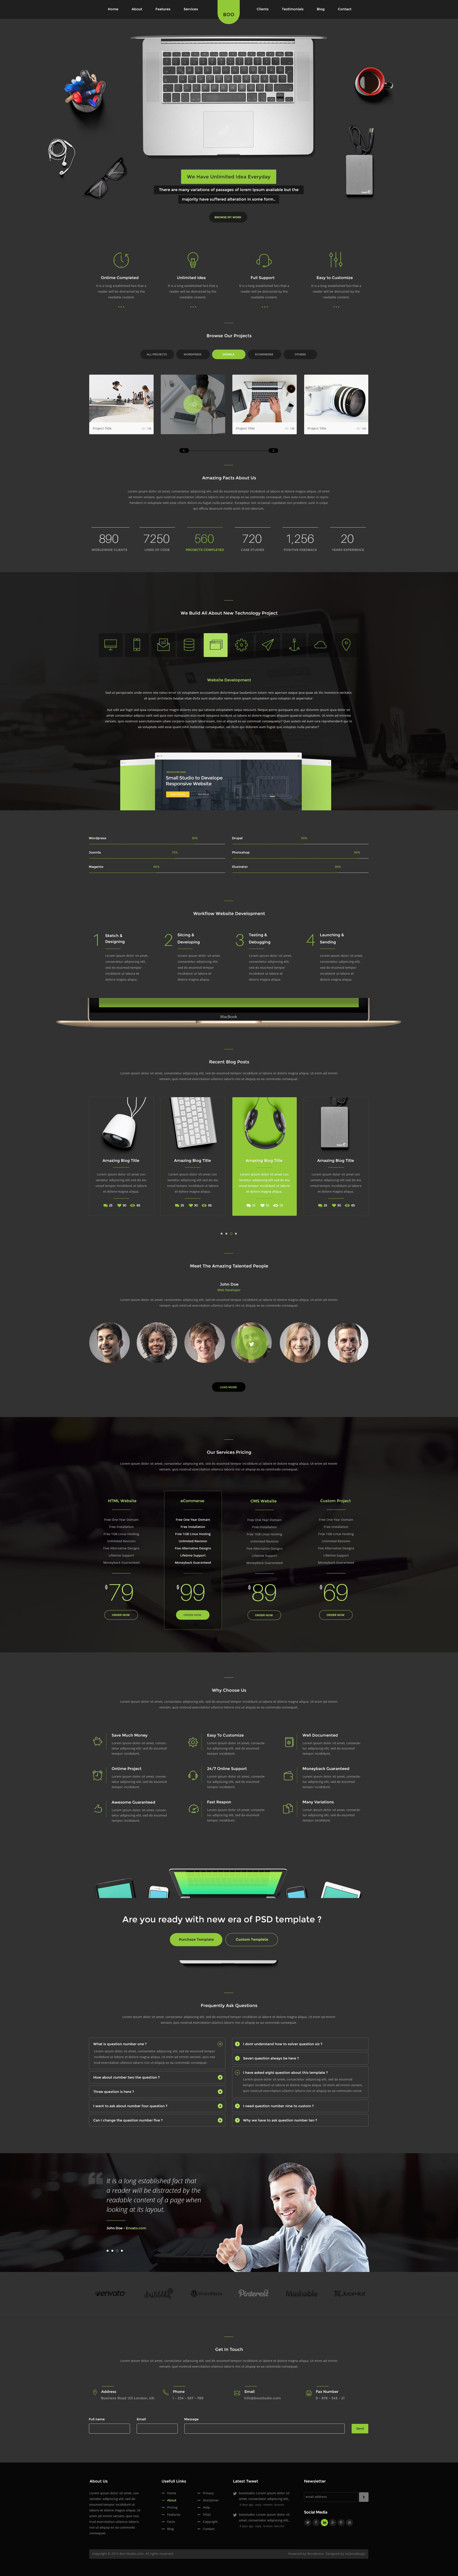 Boo   Creative - Cloud Hosting - University - eCommerce - Mobile App ...